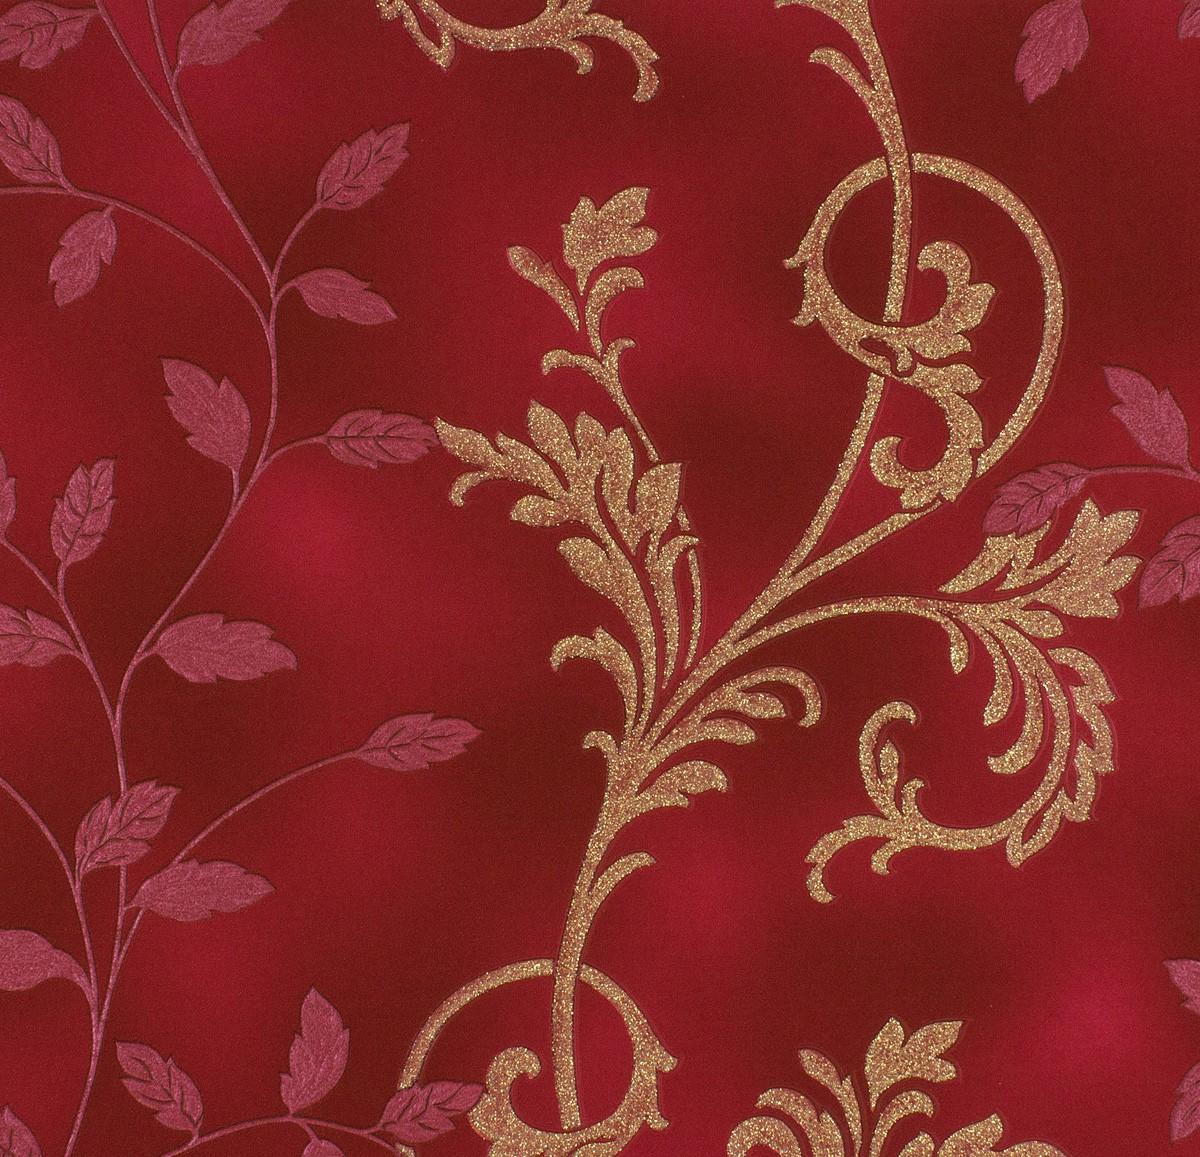 rasch diamond dust vliestapete 450545 floral rot rosarot gold glitzer 3 85 1qm ebay. Black Bedroom Furniture Sets. Home Design Ideas